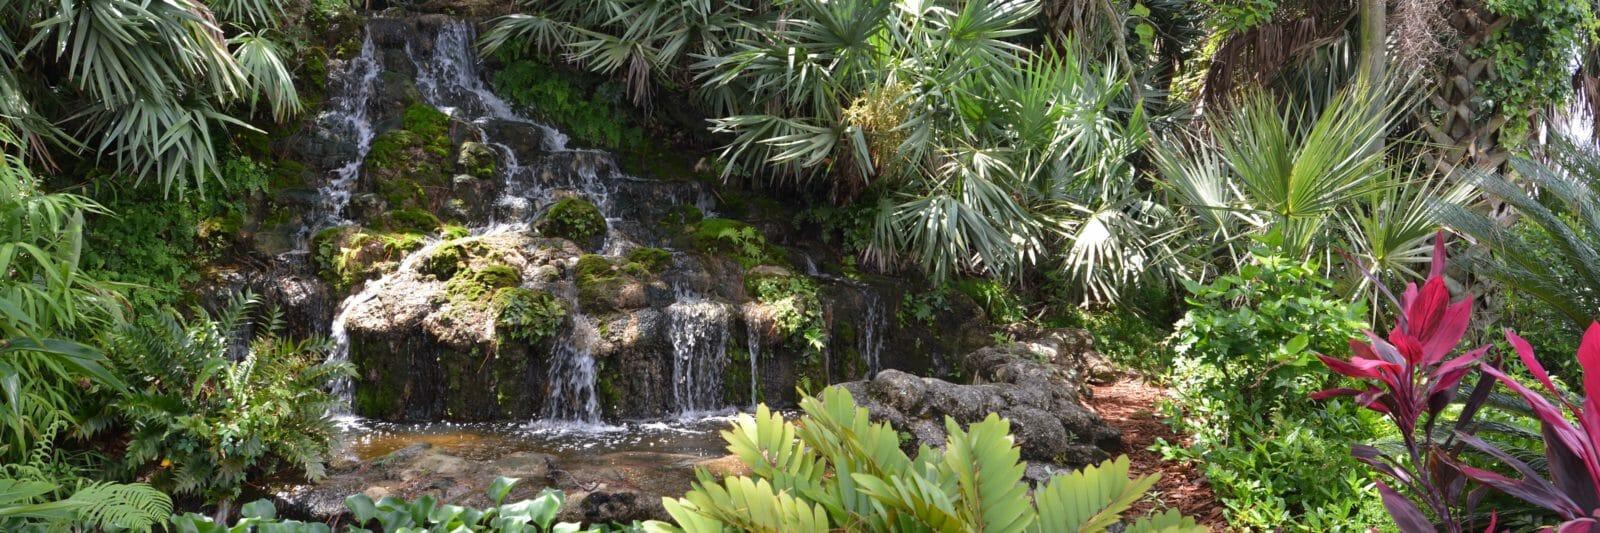 Ormond Memorial Gardens waterfall